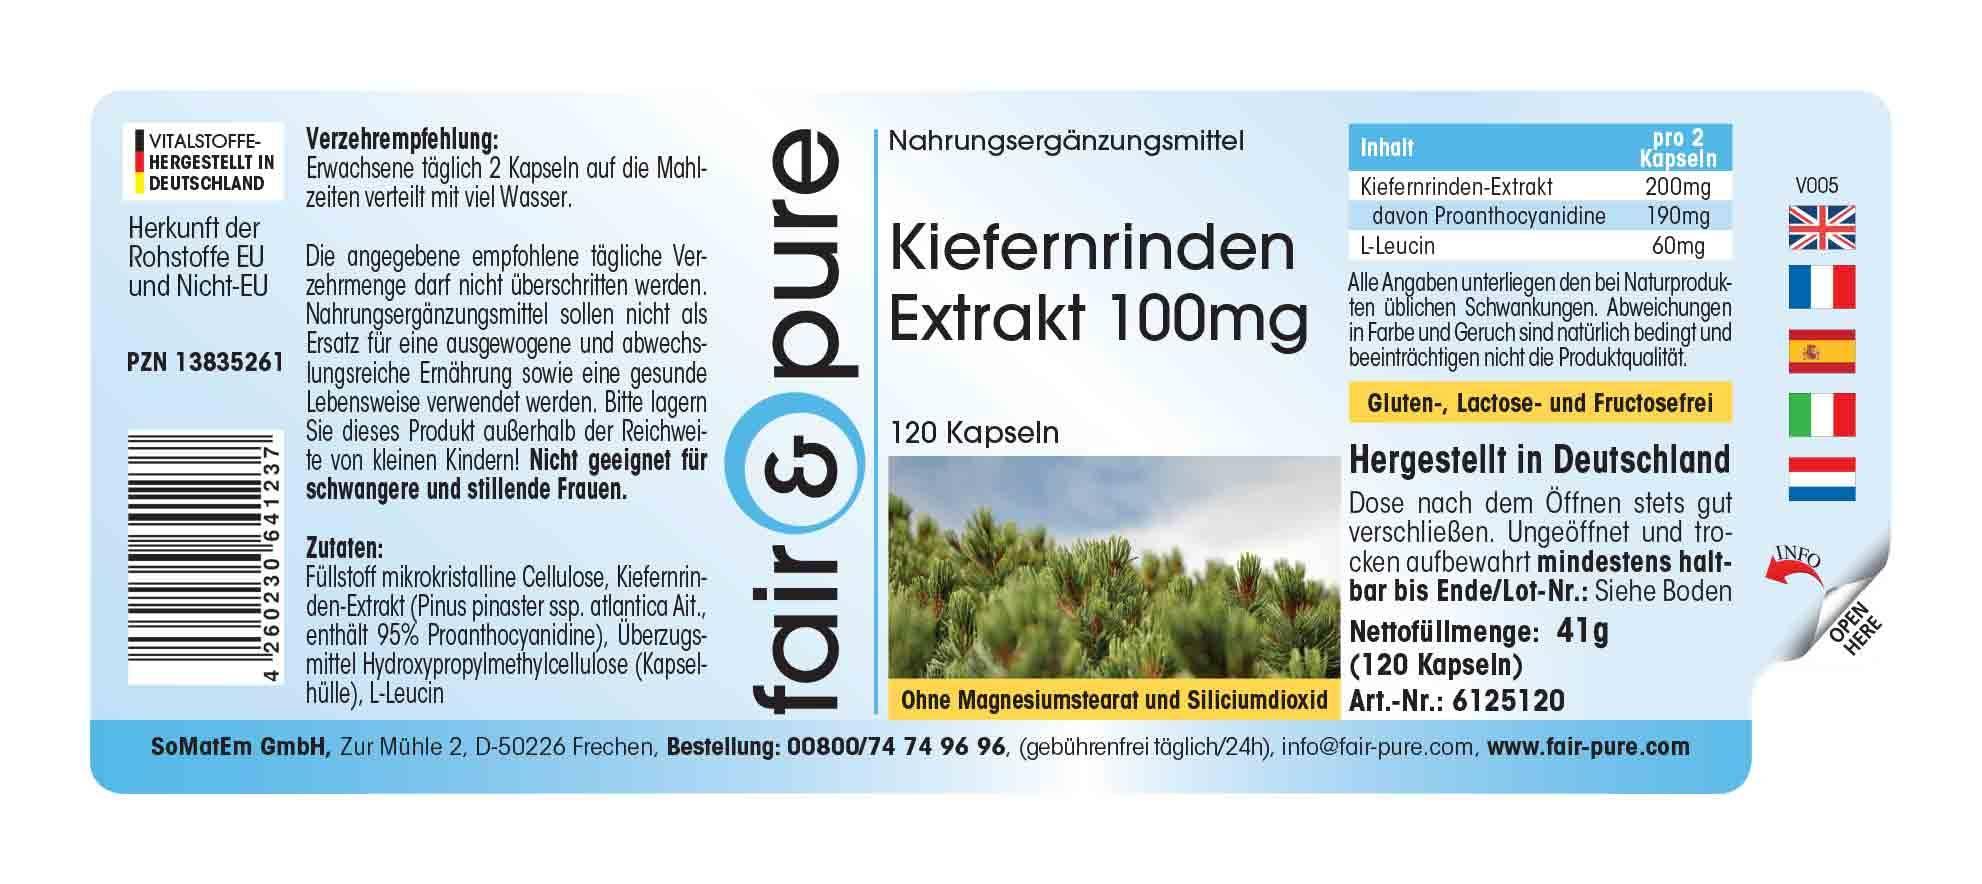 Kiefernrinden-Extrakt 100mg, 95% Proanthocyanidine, vegan